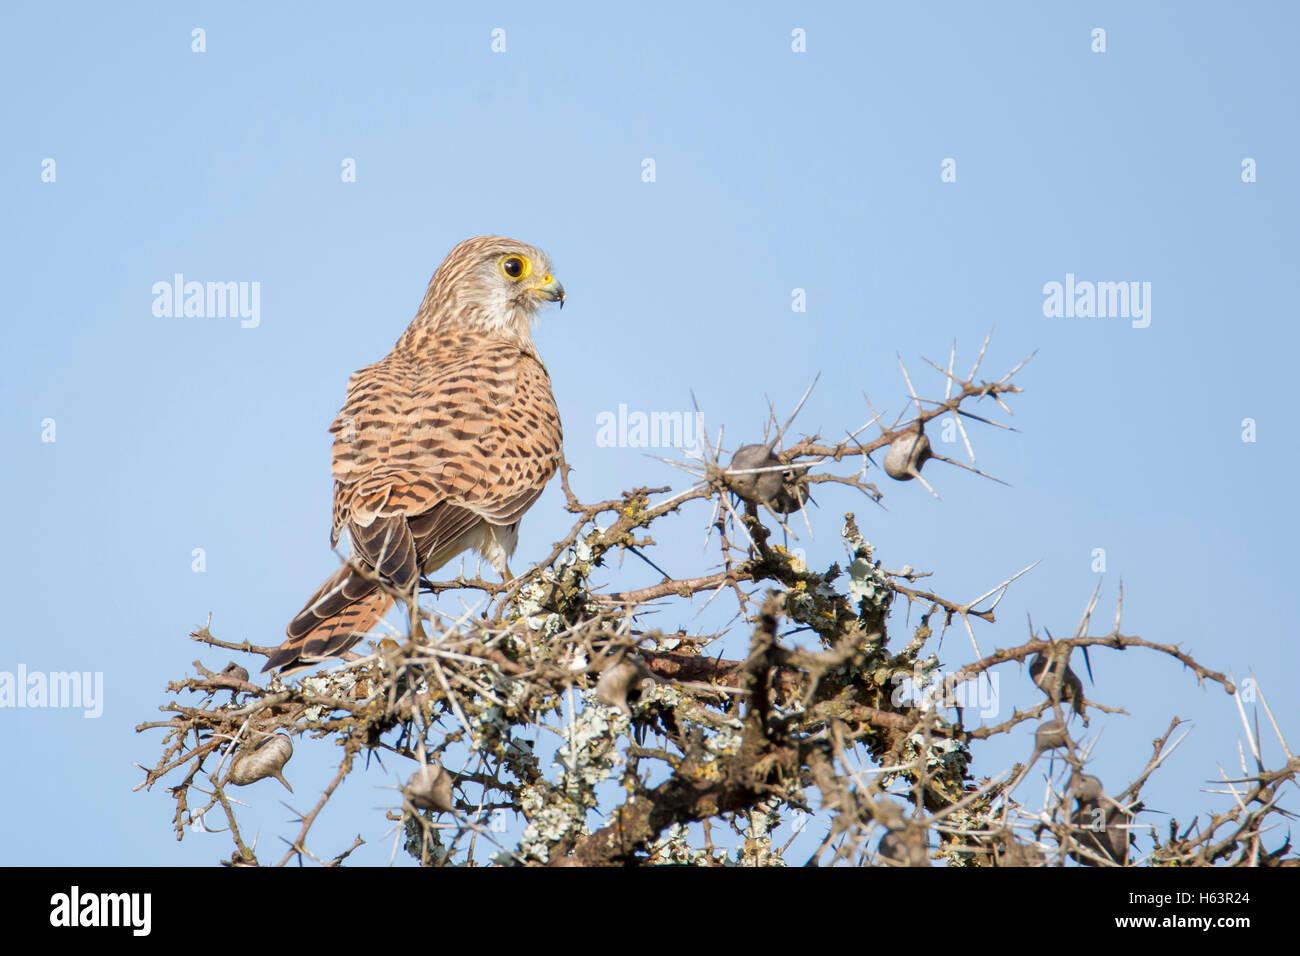 common kestrel Falco tinnunculus Laikipia Kenya Africa perched on an Acacia, back view - Stock Image